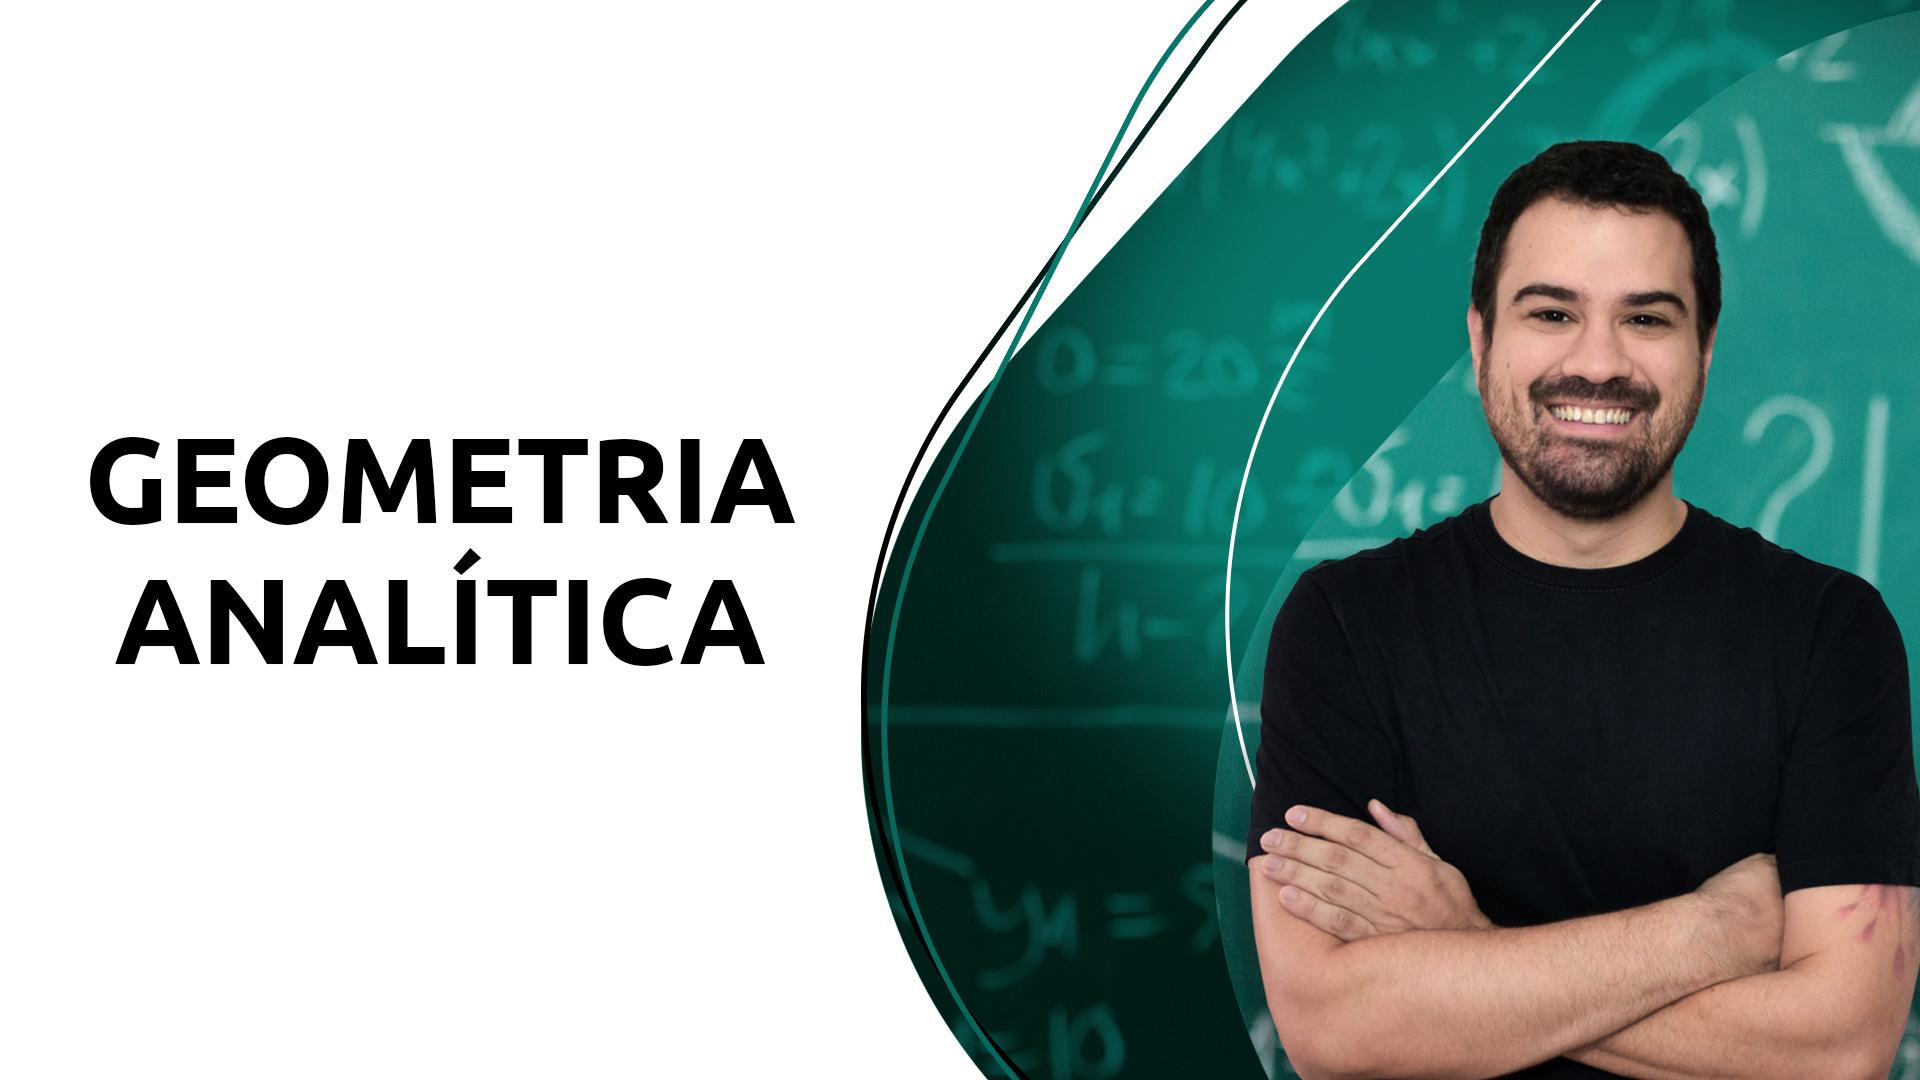 Prof. Gabriel Miranda - Curso de Matemática - Geometria